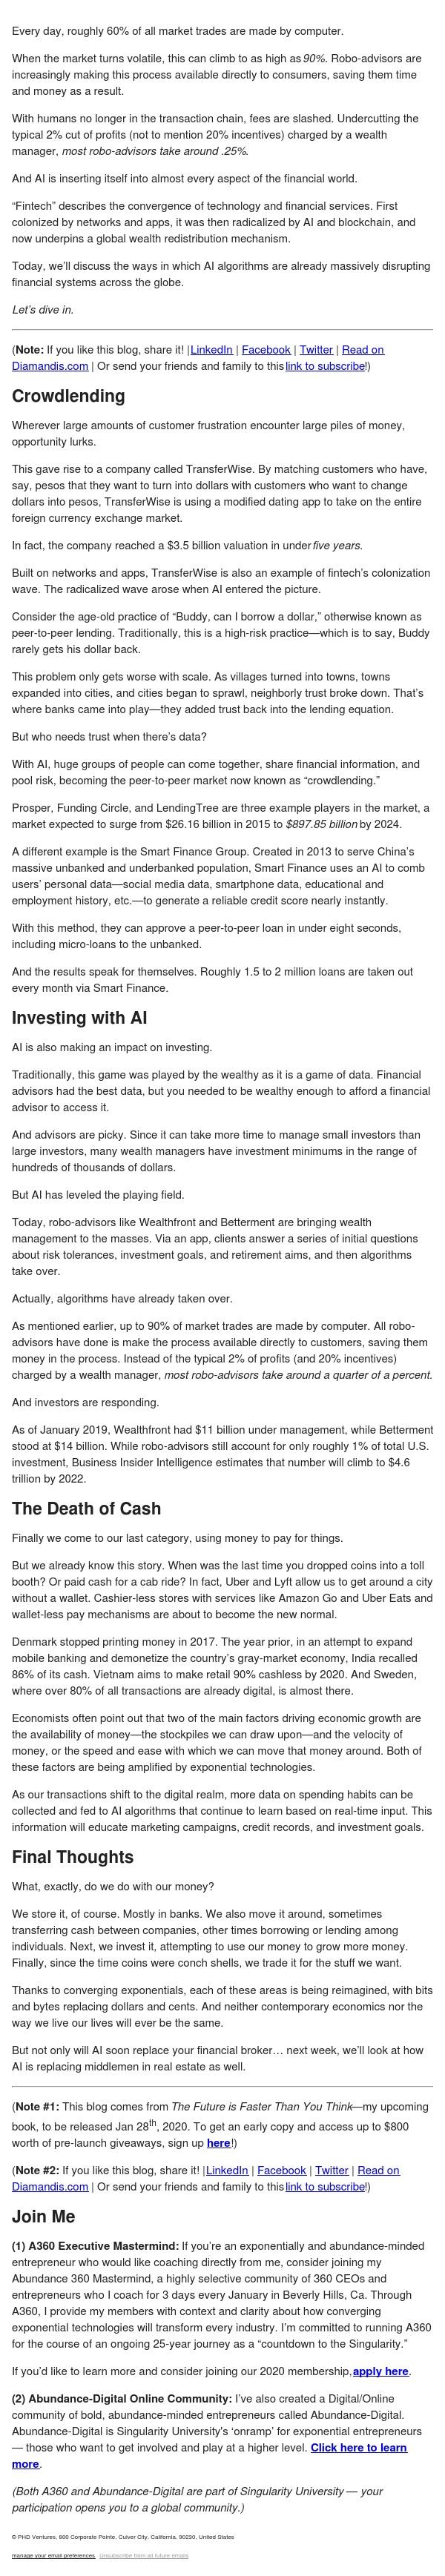 Future of Money - AI Investors, Death of Cash & the Crowd...